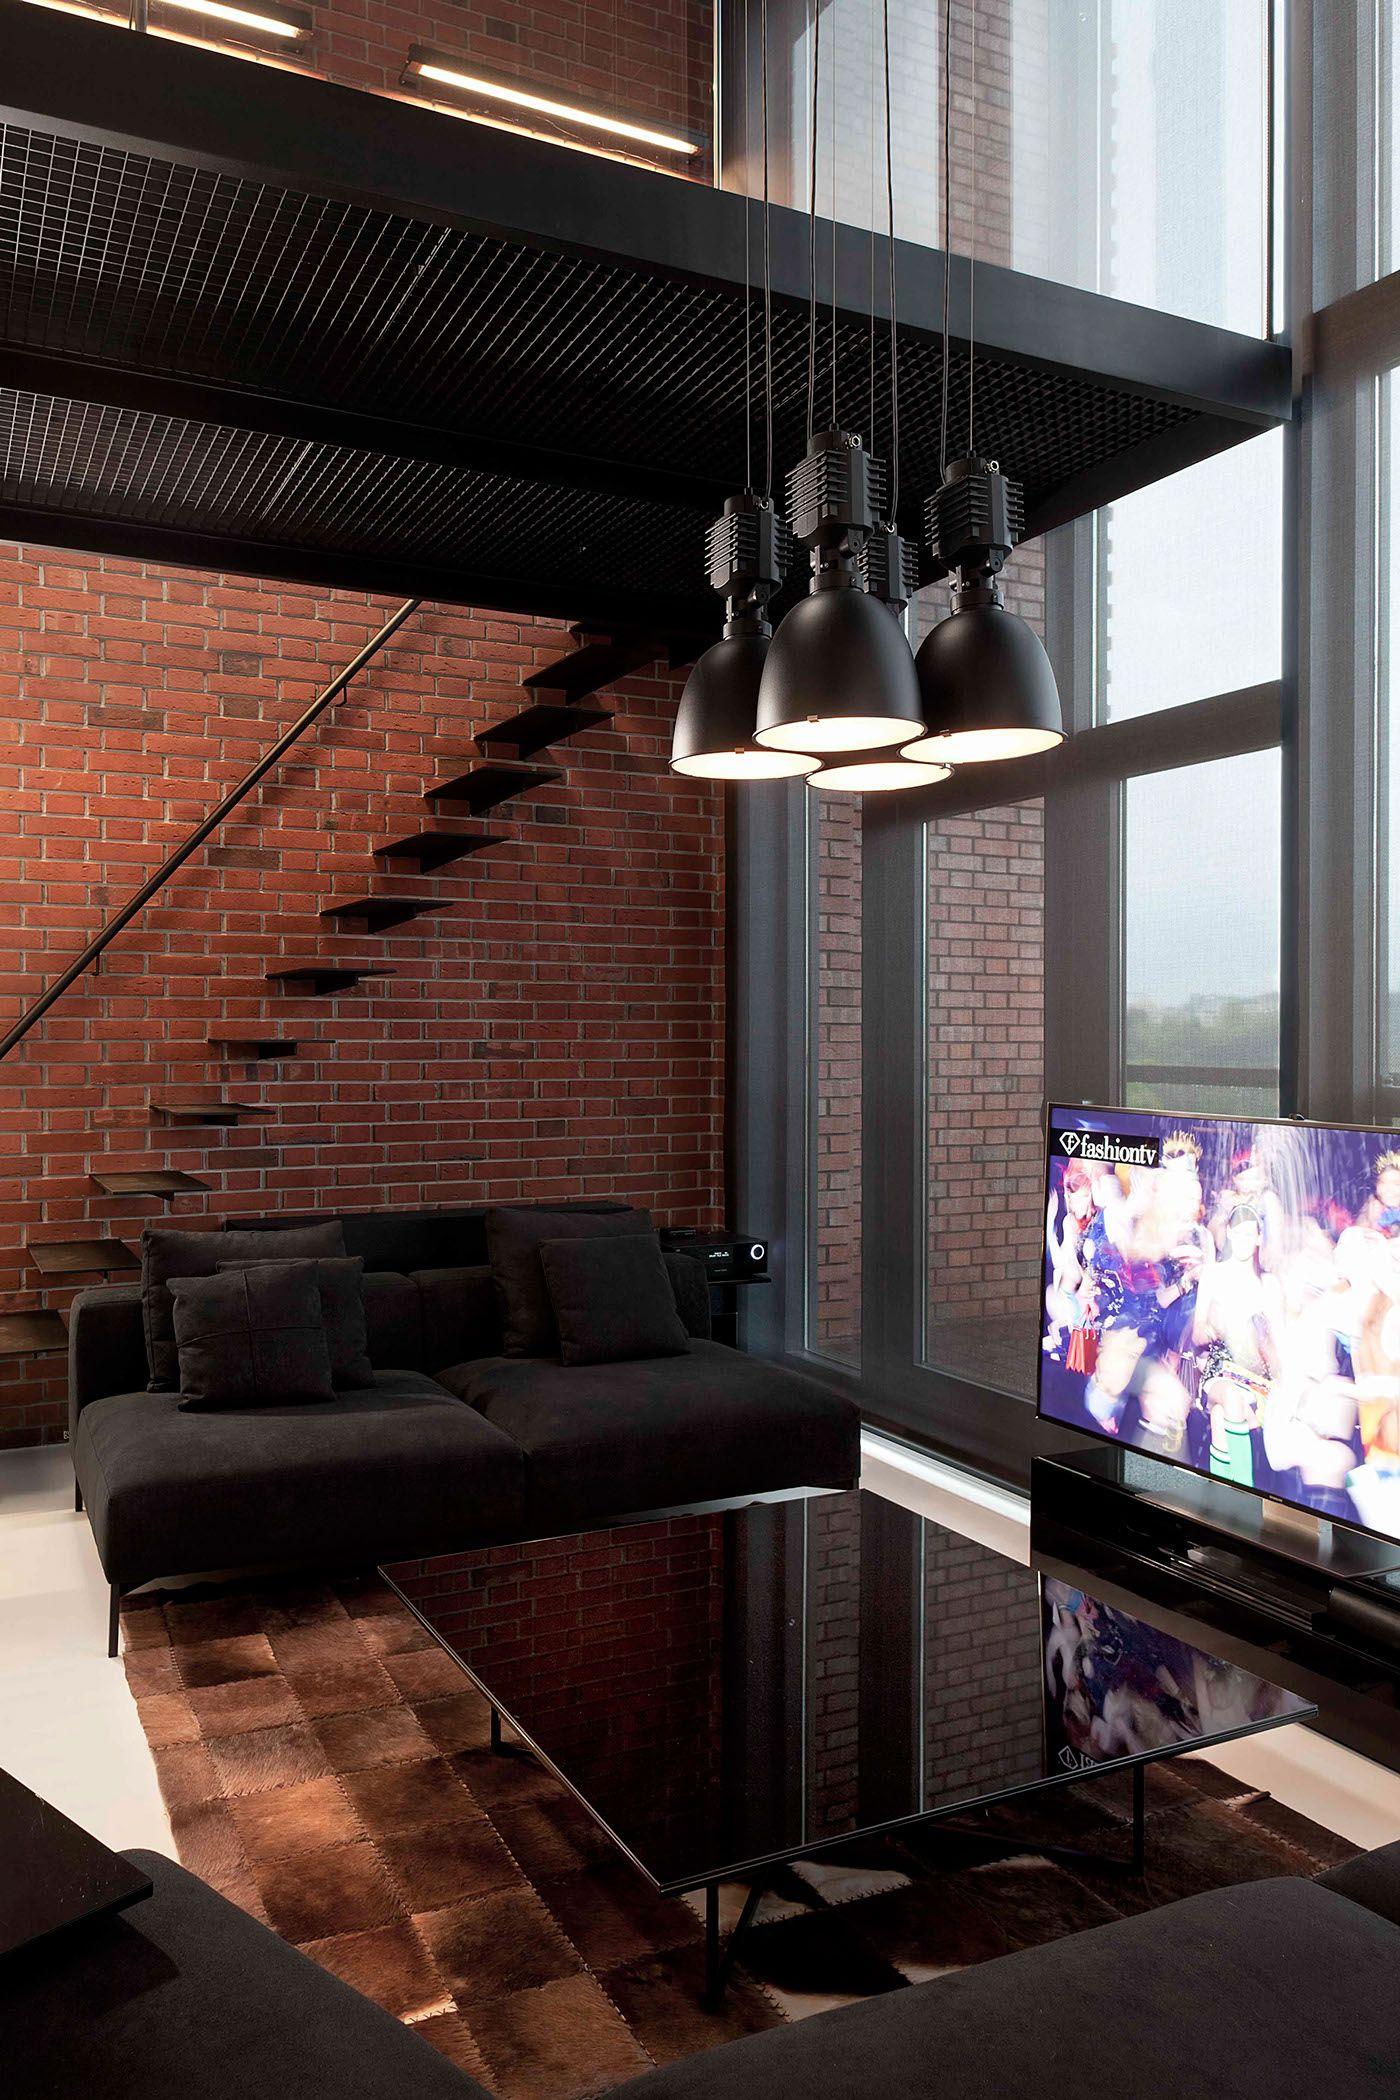 Brick Loft Apartment stylish exposed brick wall lofts | home decorating ideas